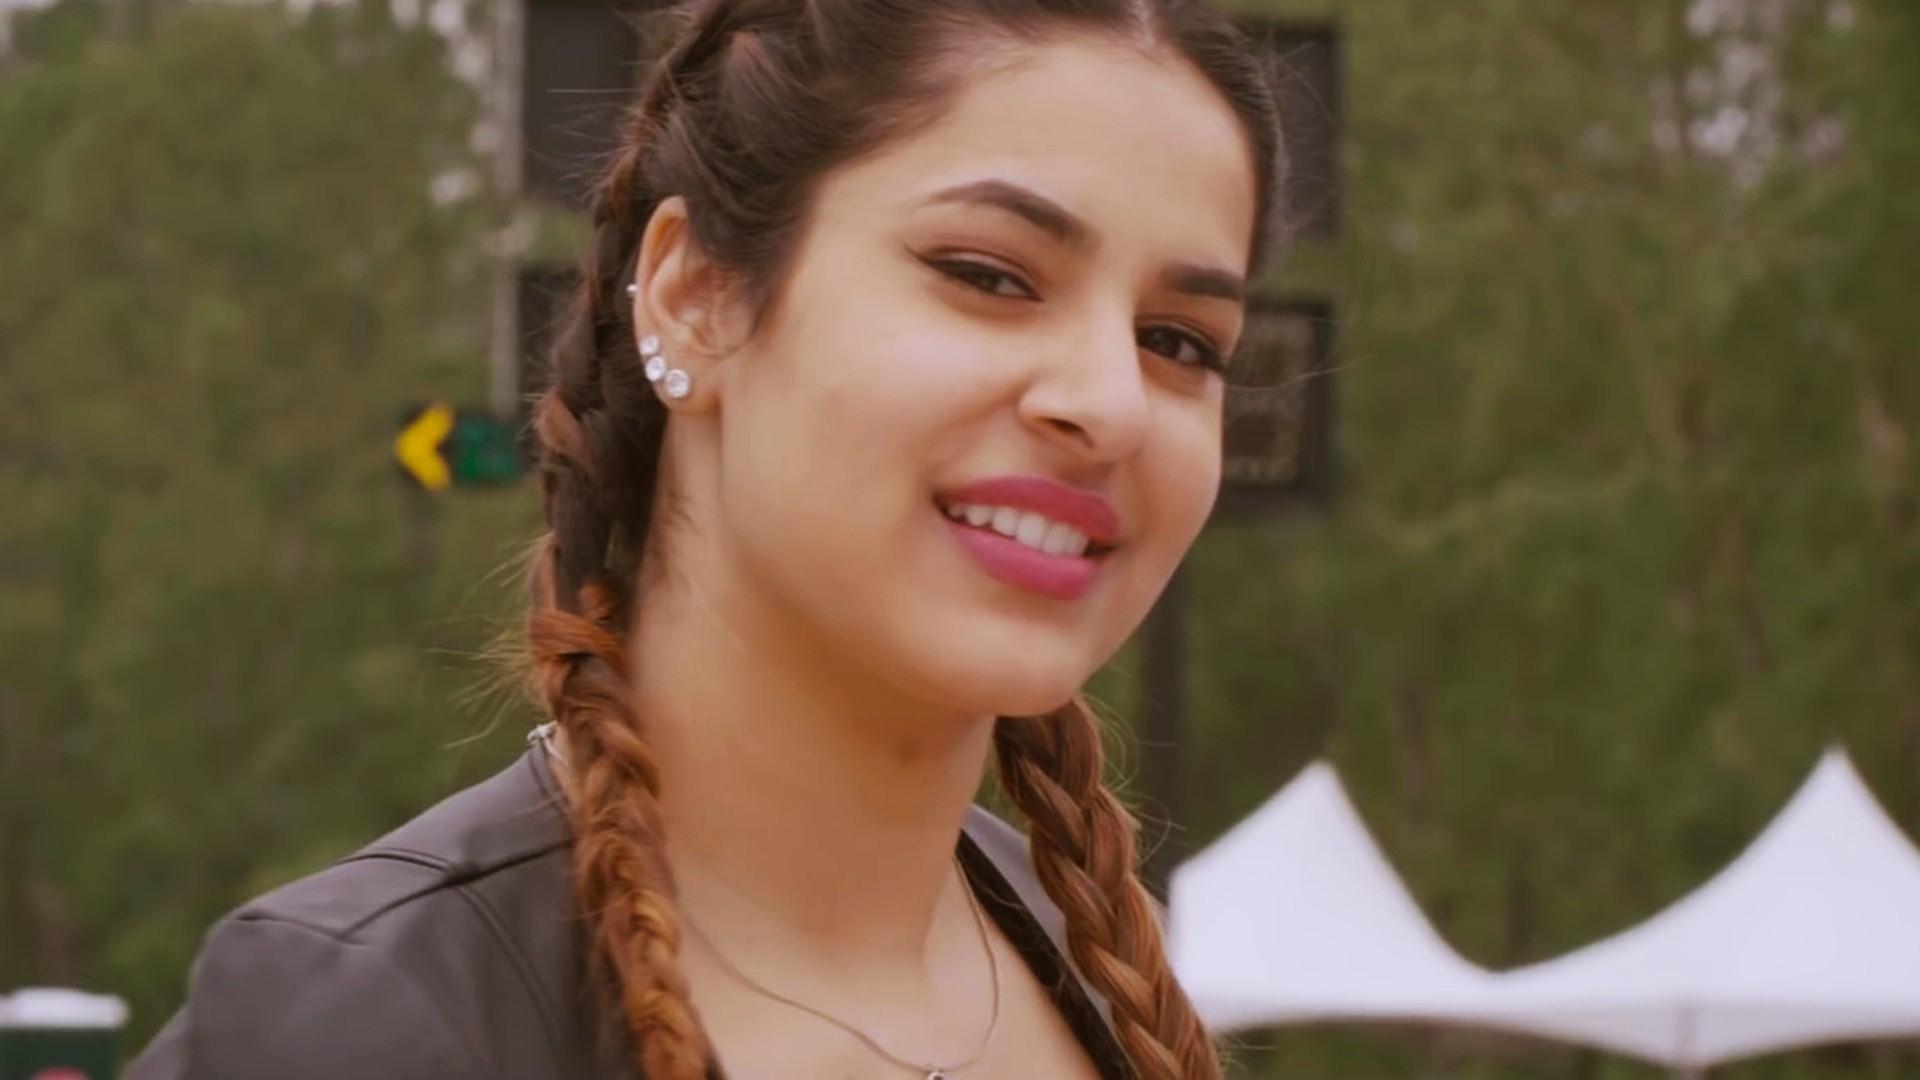 Punjabi Beautiful Girl Hd Wallpaper Pretty Sim Khurme Wallpaper 02329 Baltana